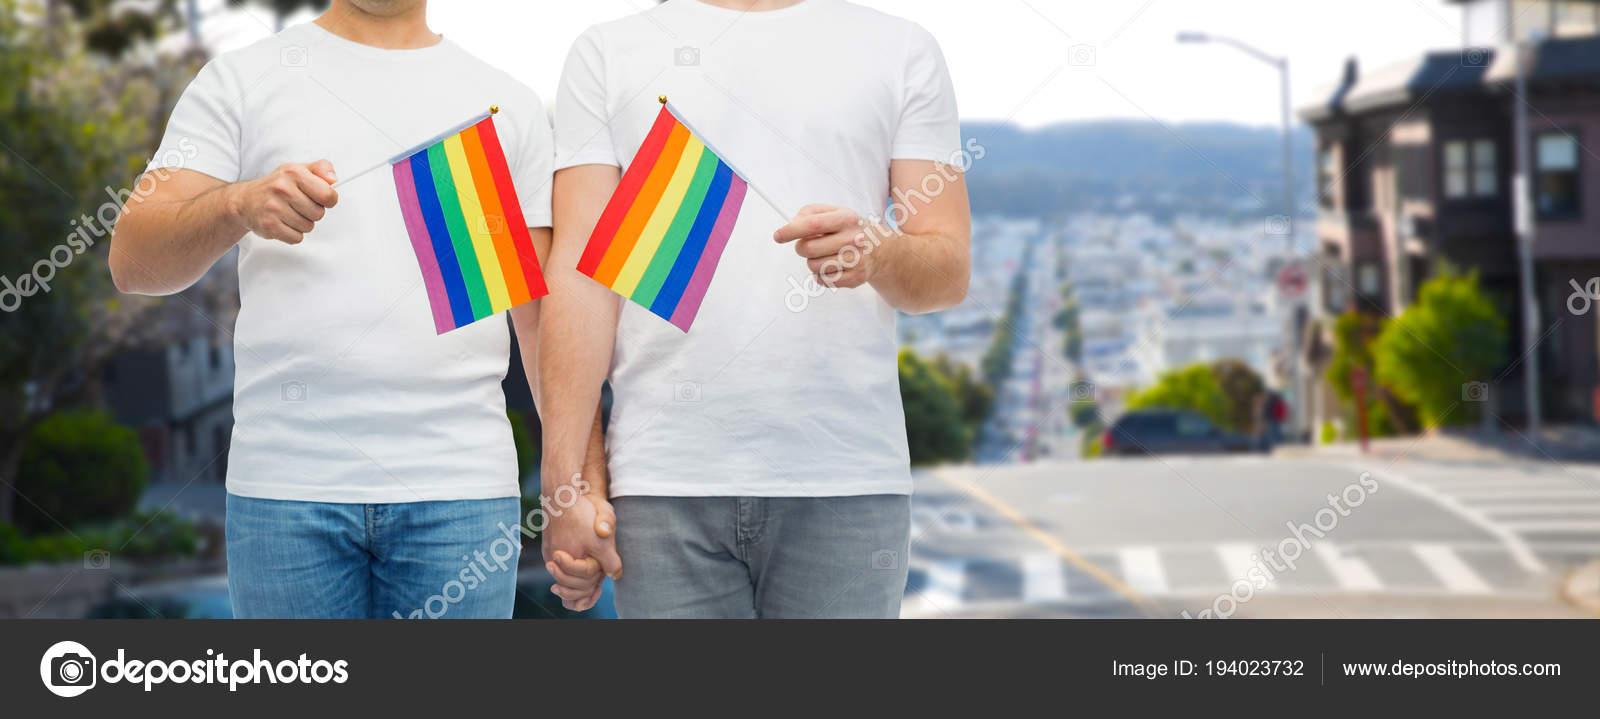 Alternative rehab and gay friendly